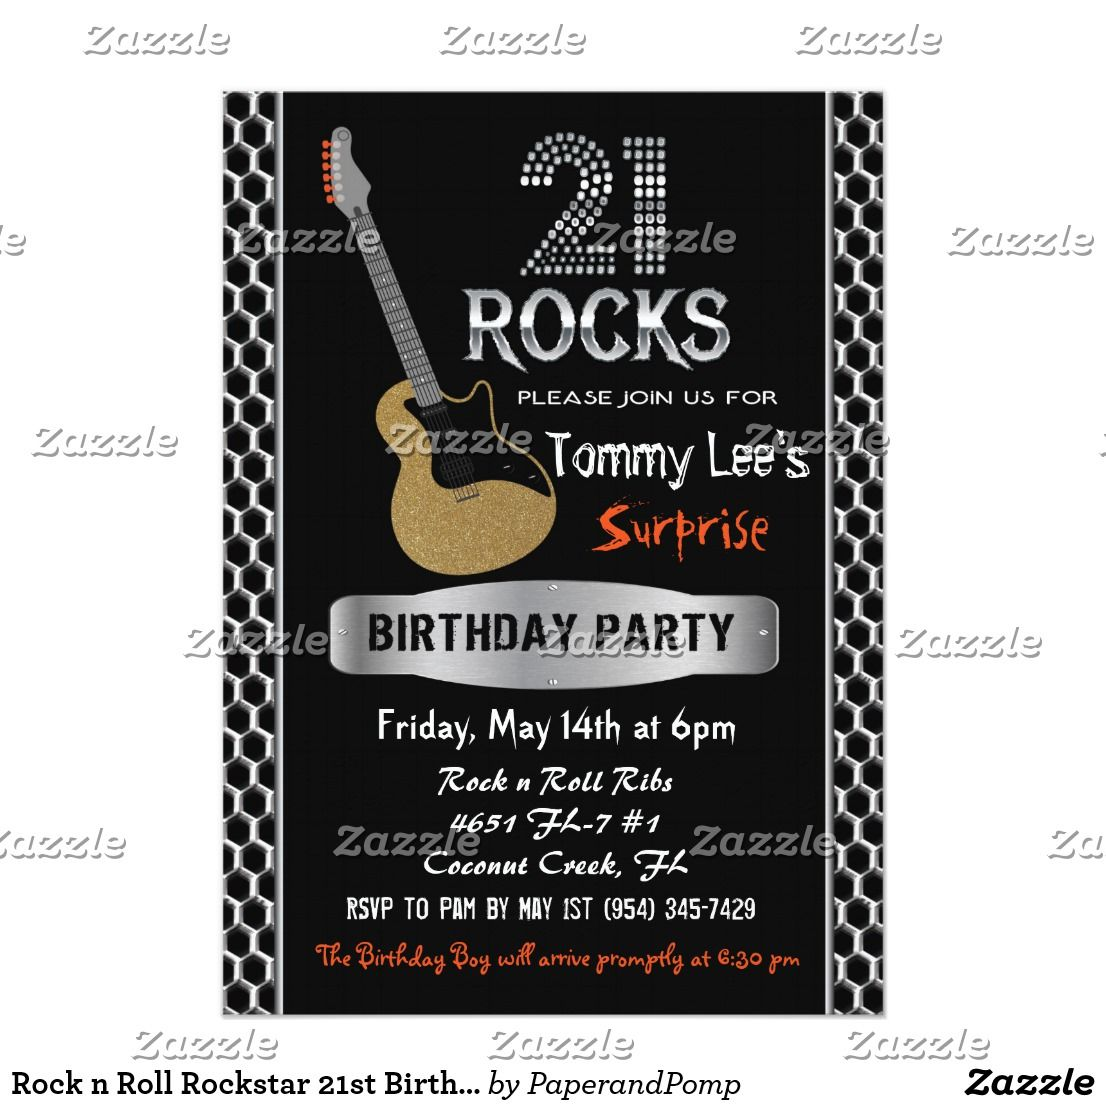 Rock n Roll Rockstar 21st Birthday Invitation | Birthdays